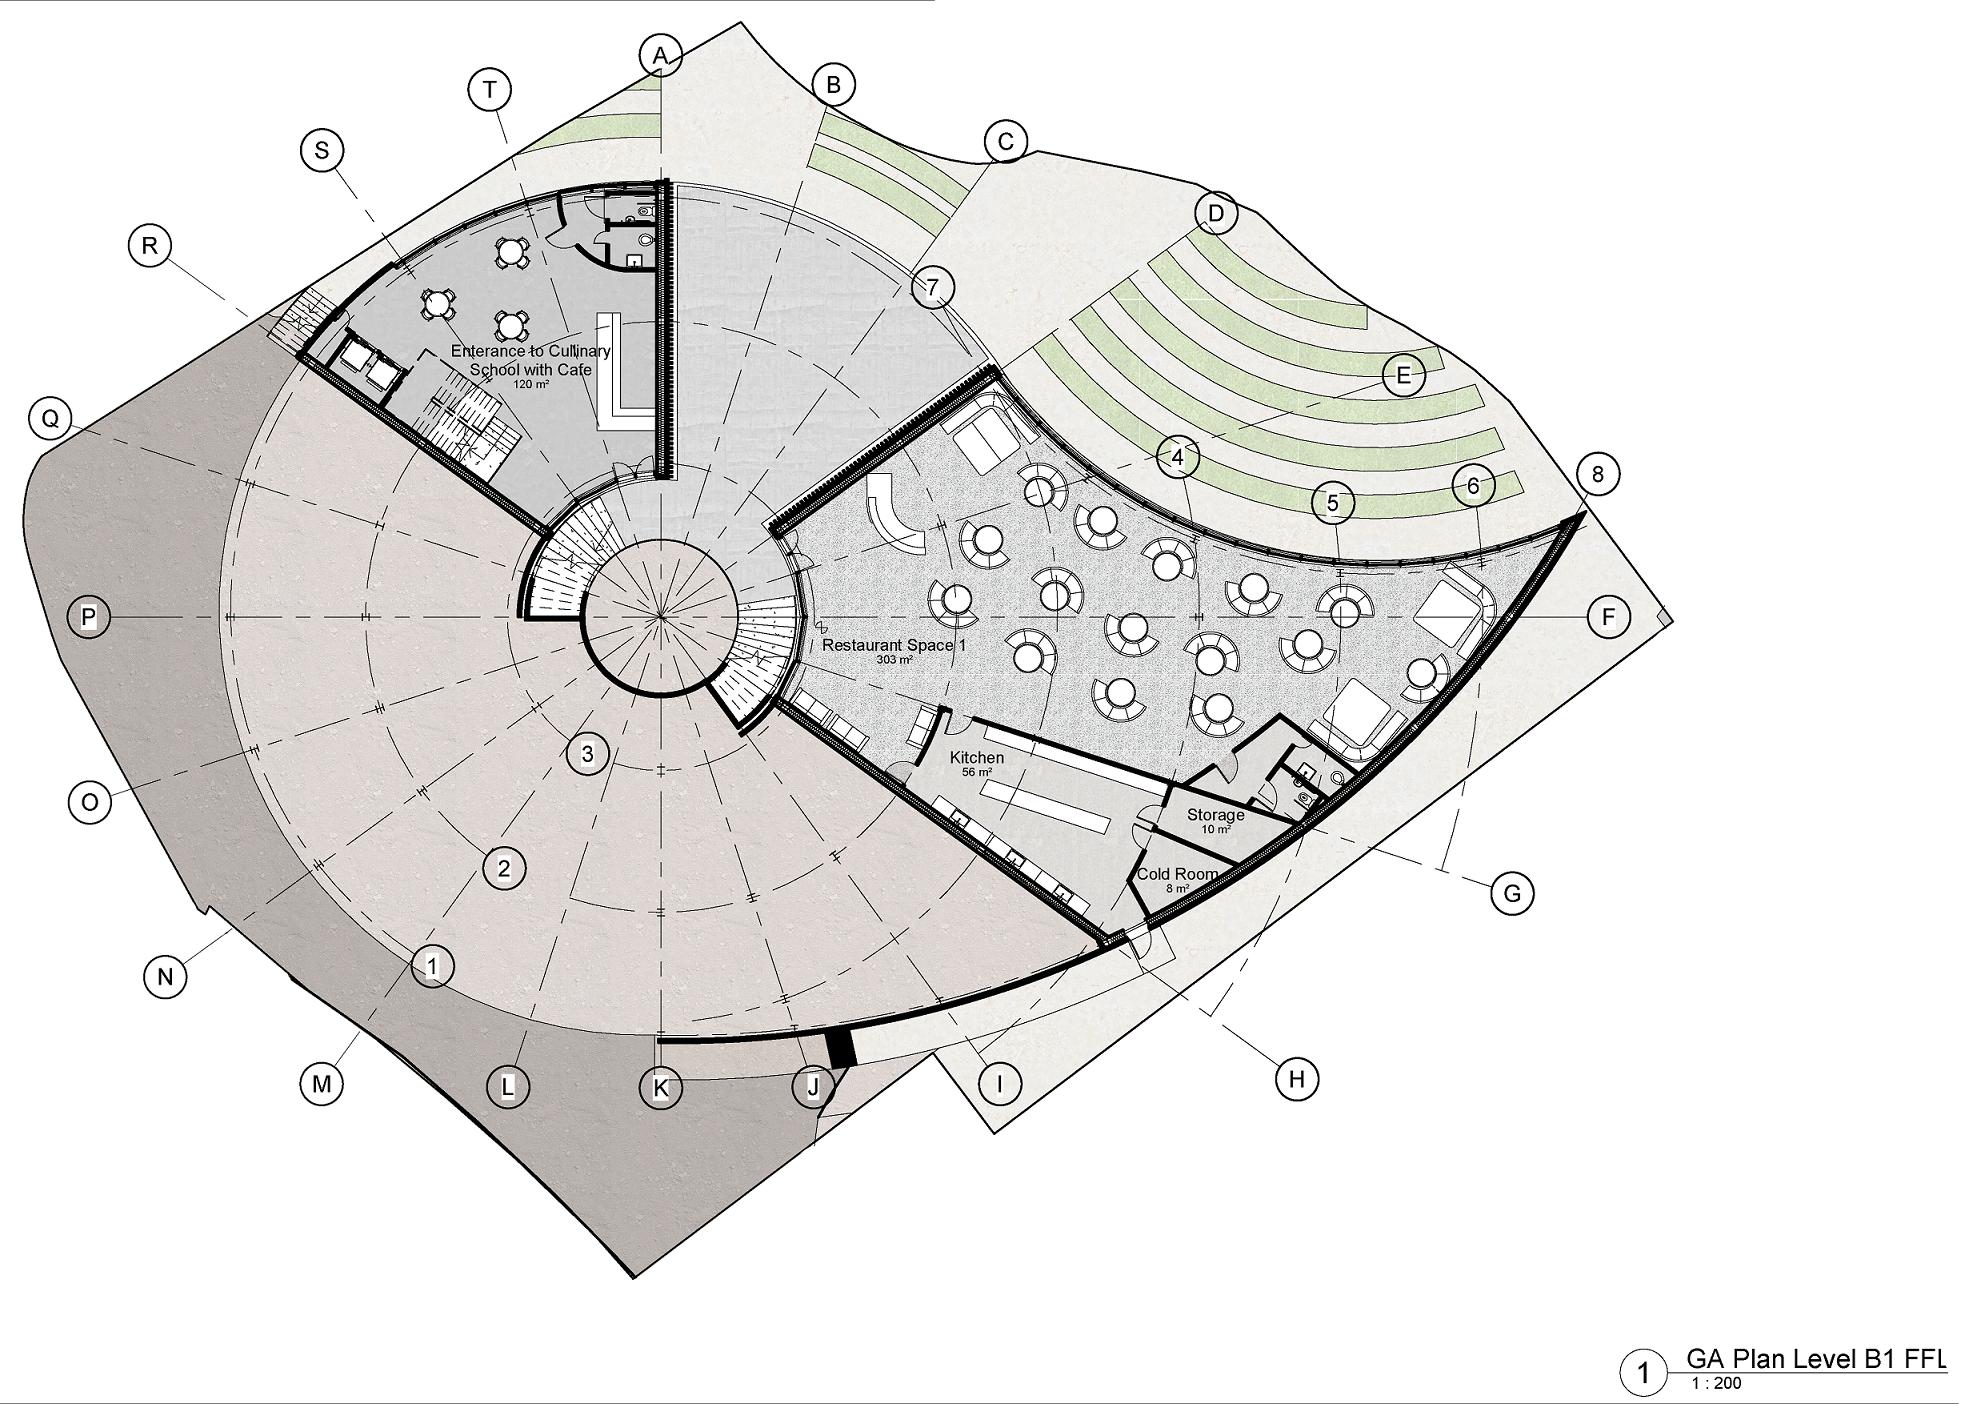 Culinary School basement plan diagram